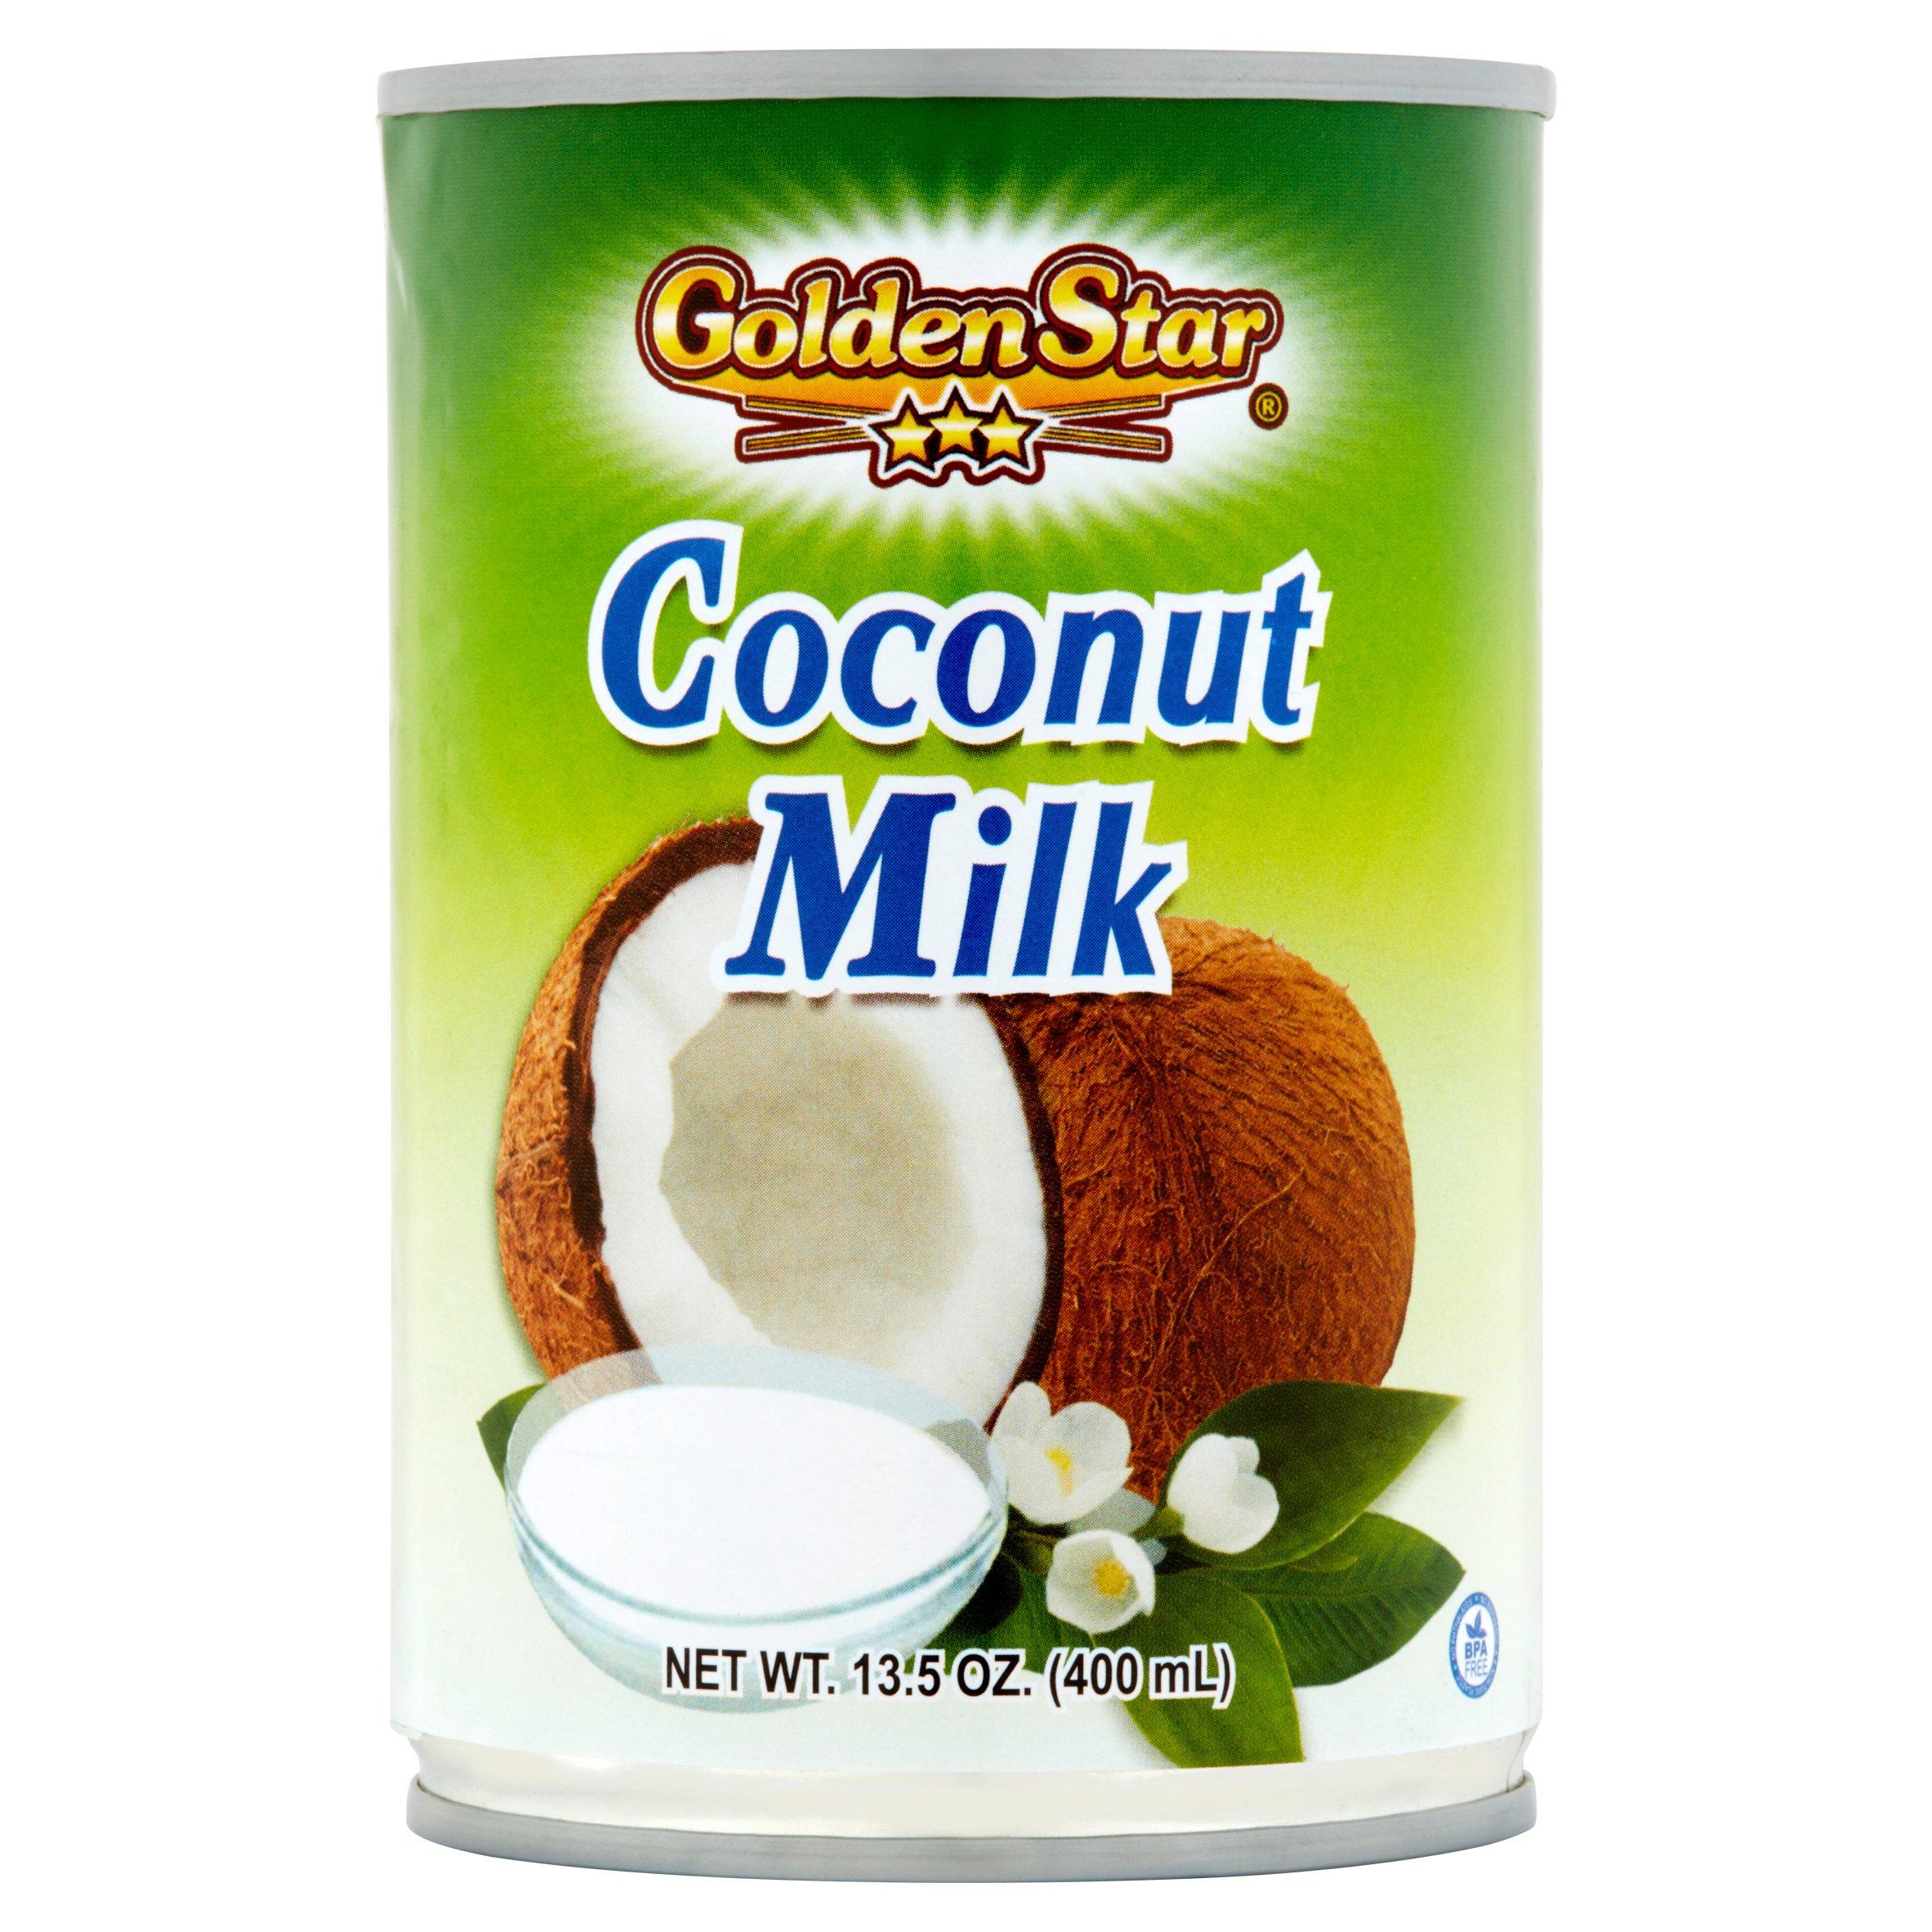 Golden Star Coconut Milk, 13.5 oz by Golden Star Trading, Inc.